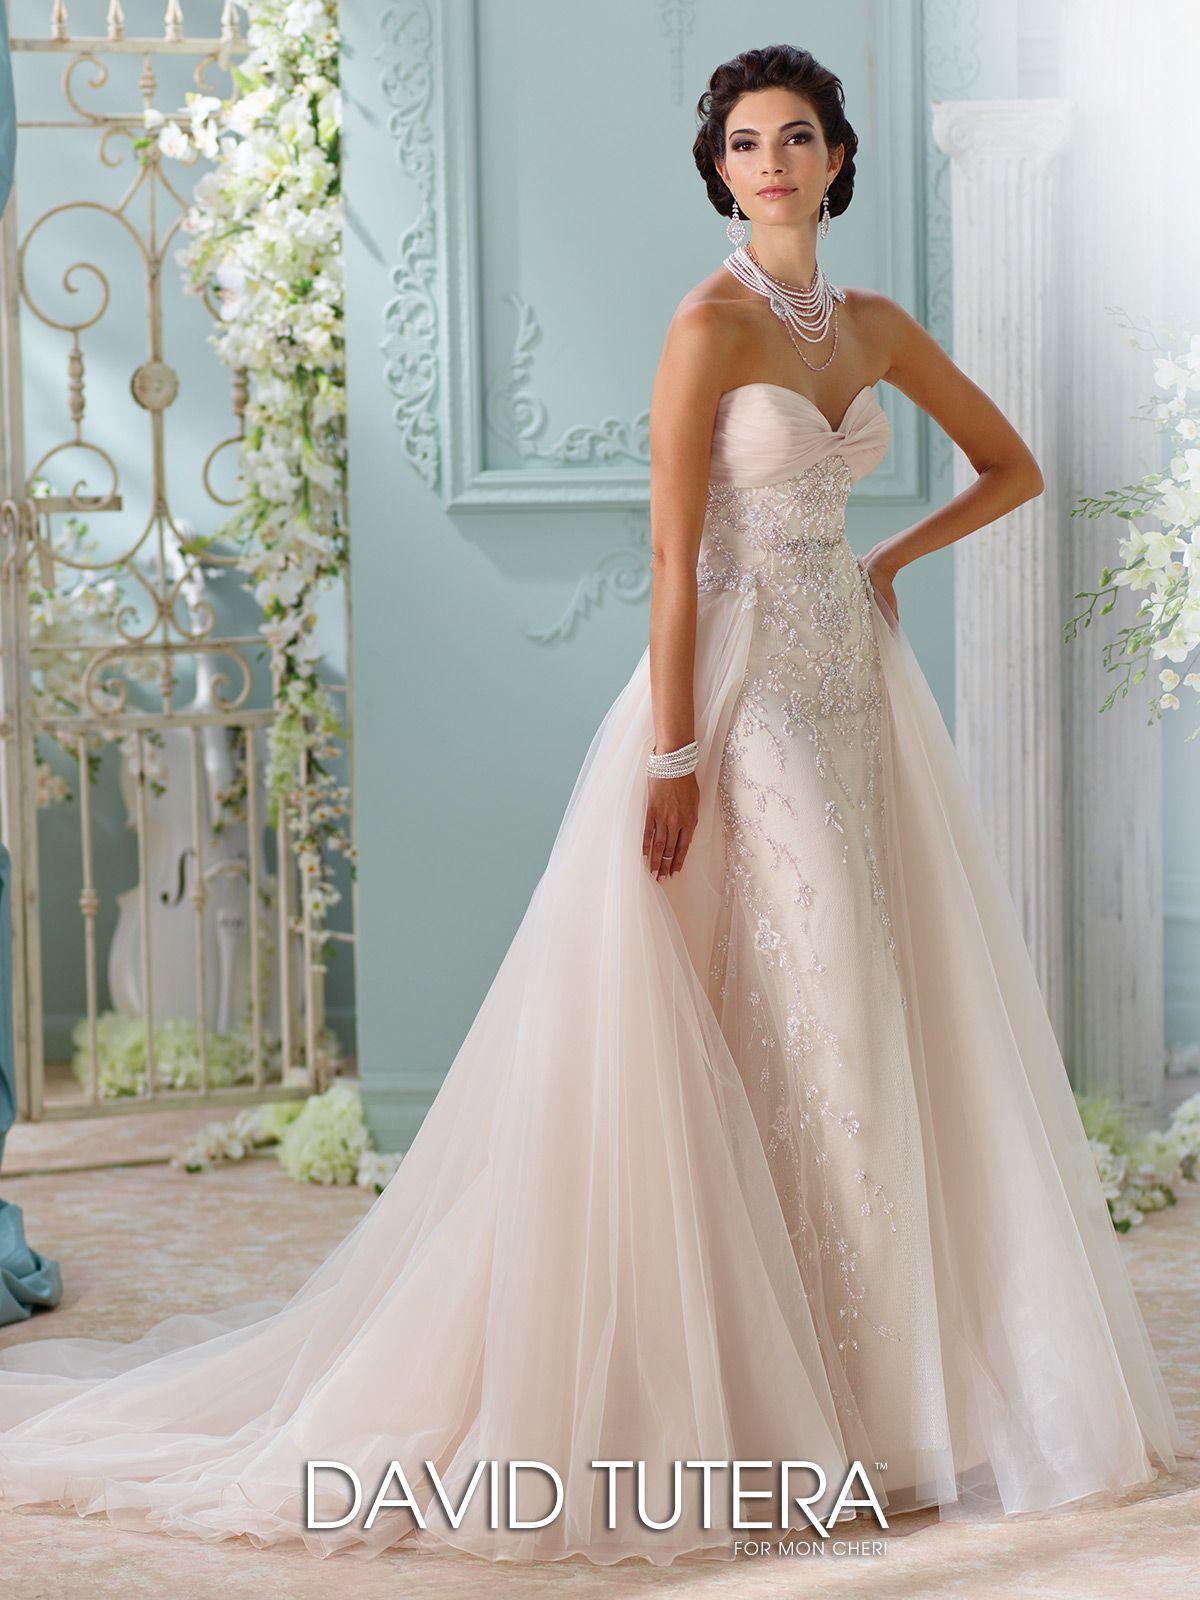 Unique Wedding Dresses Fall 2018 - Martin Thornburg | Bodice, Gowns ...